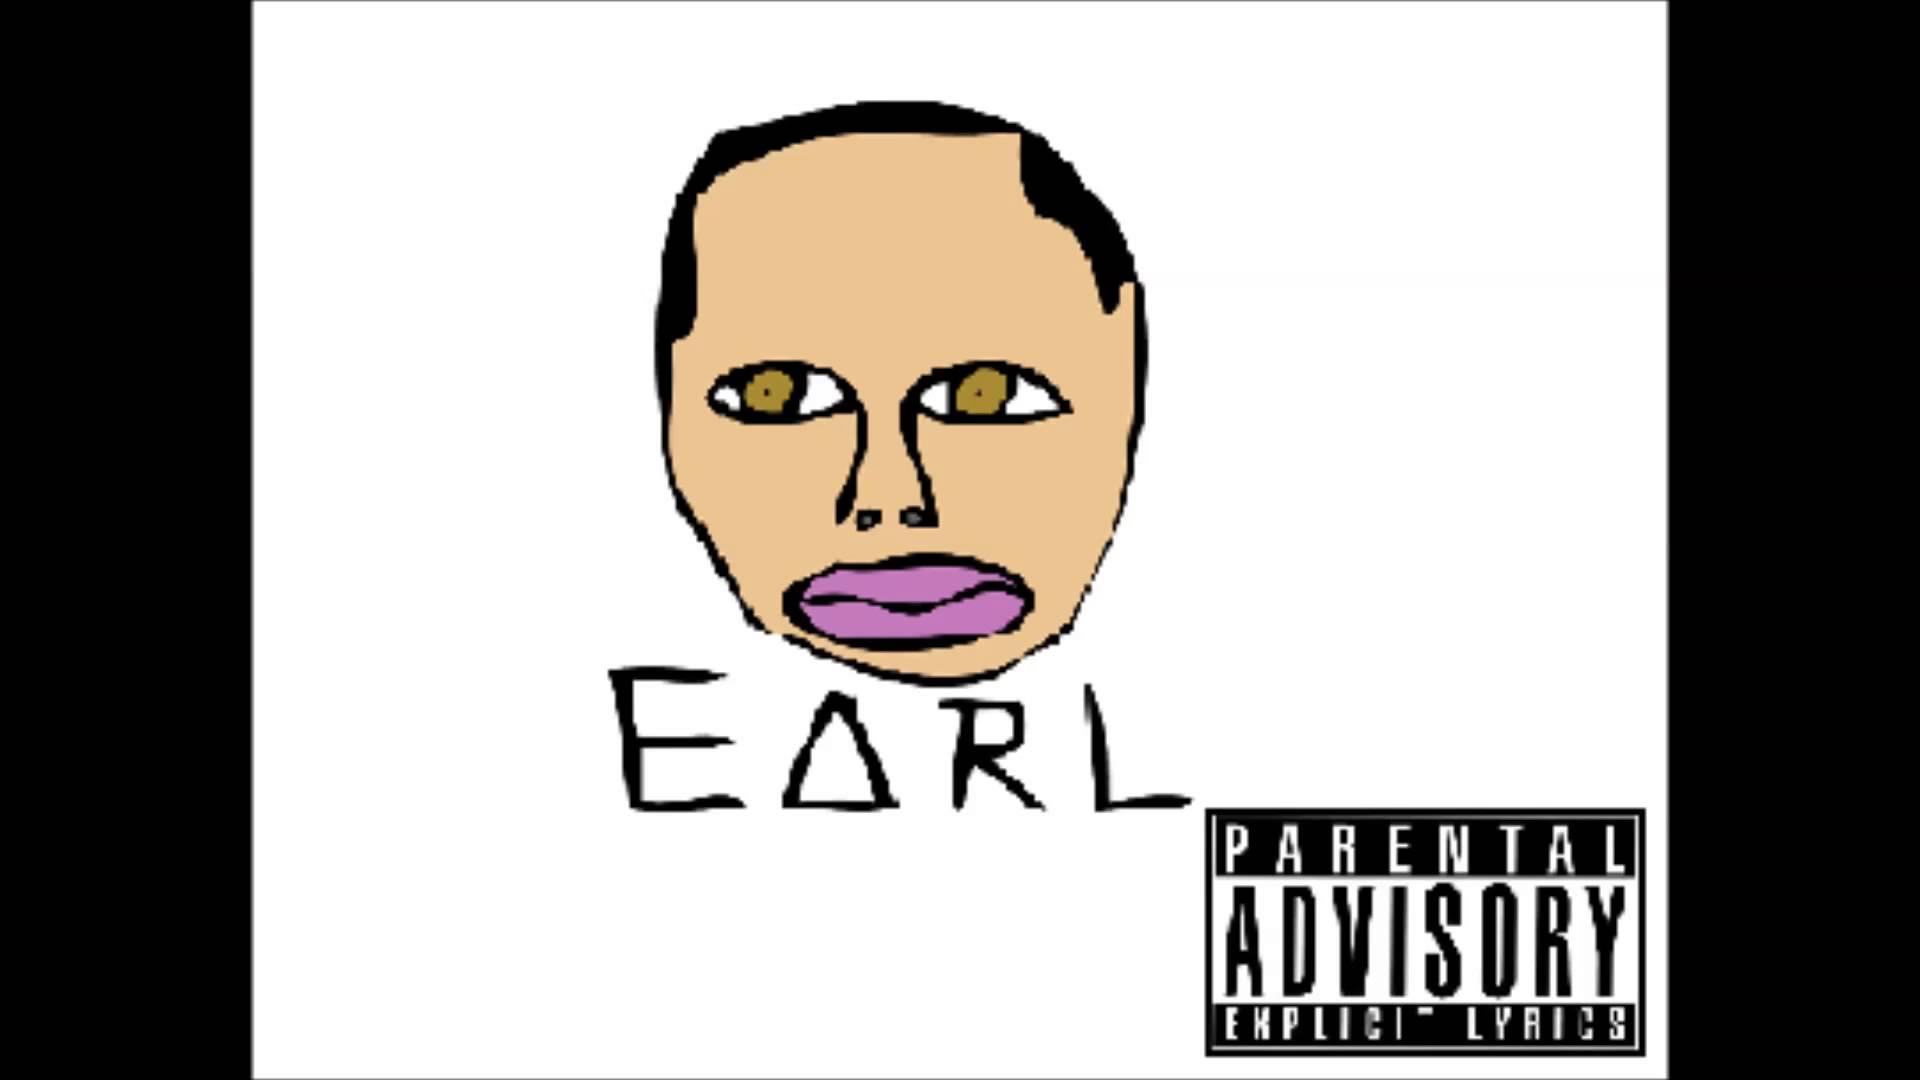 [49+] Earl Sweatshirt Wallpaper on WallpaperSafari Earl Sweatshirt Logo